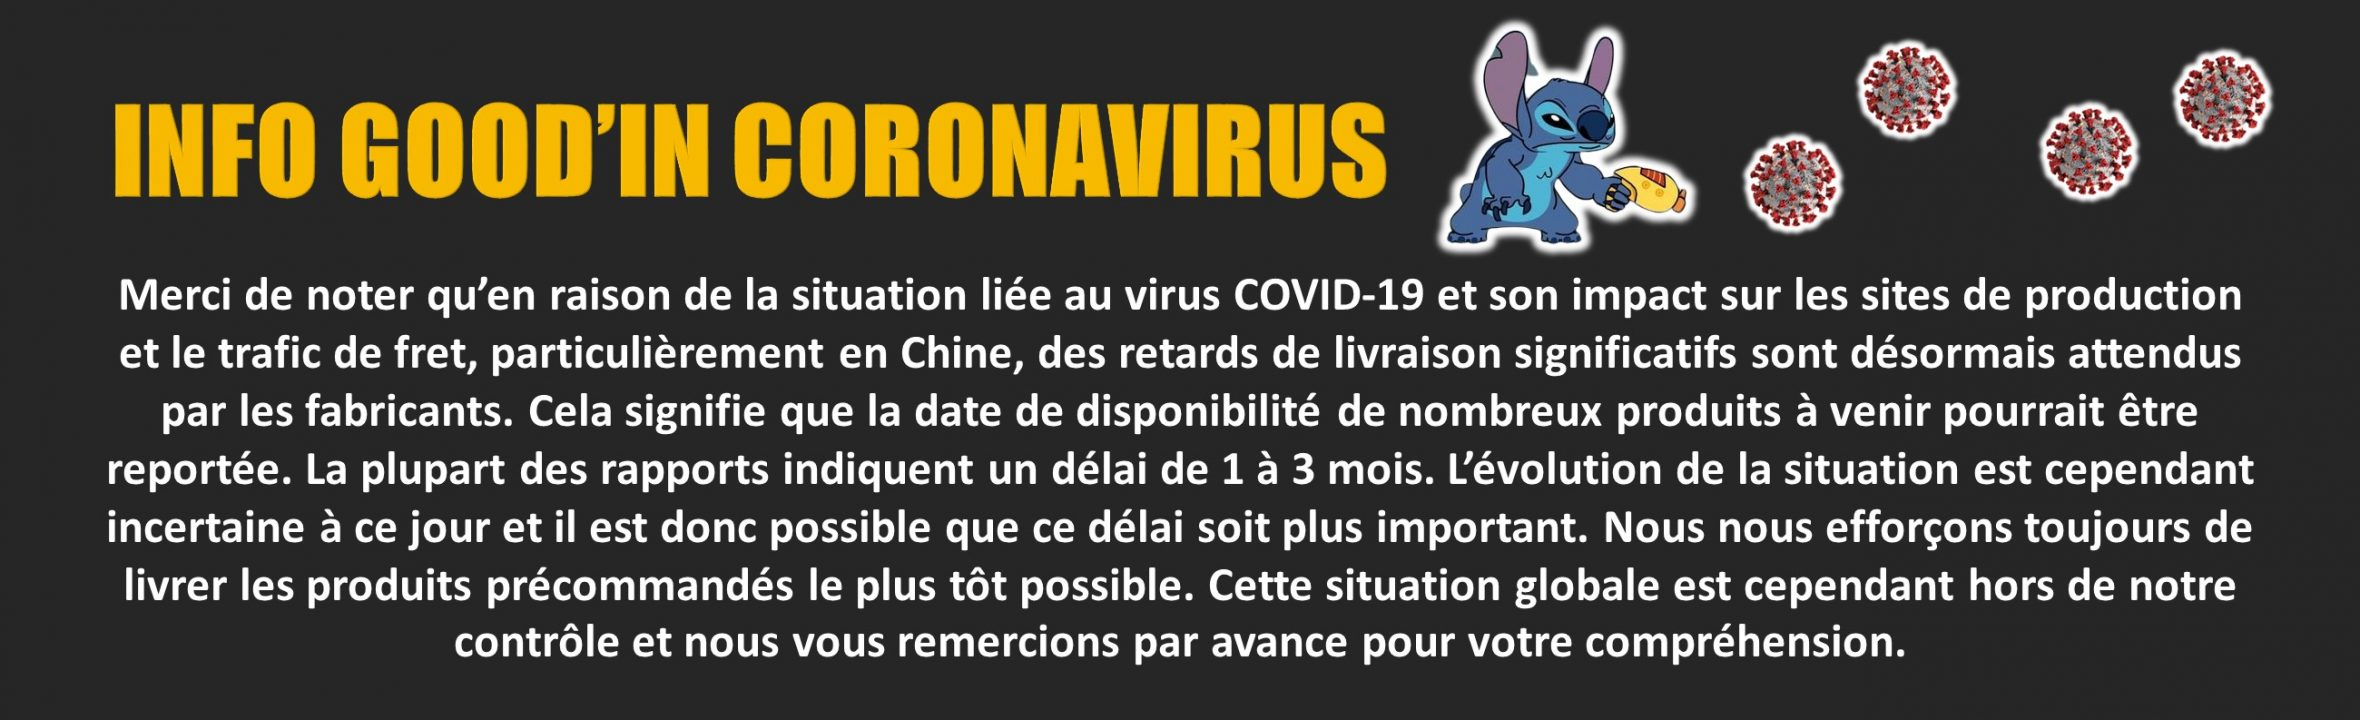 Flash info coronavirus Goodin shop